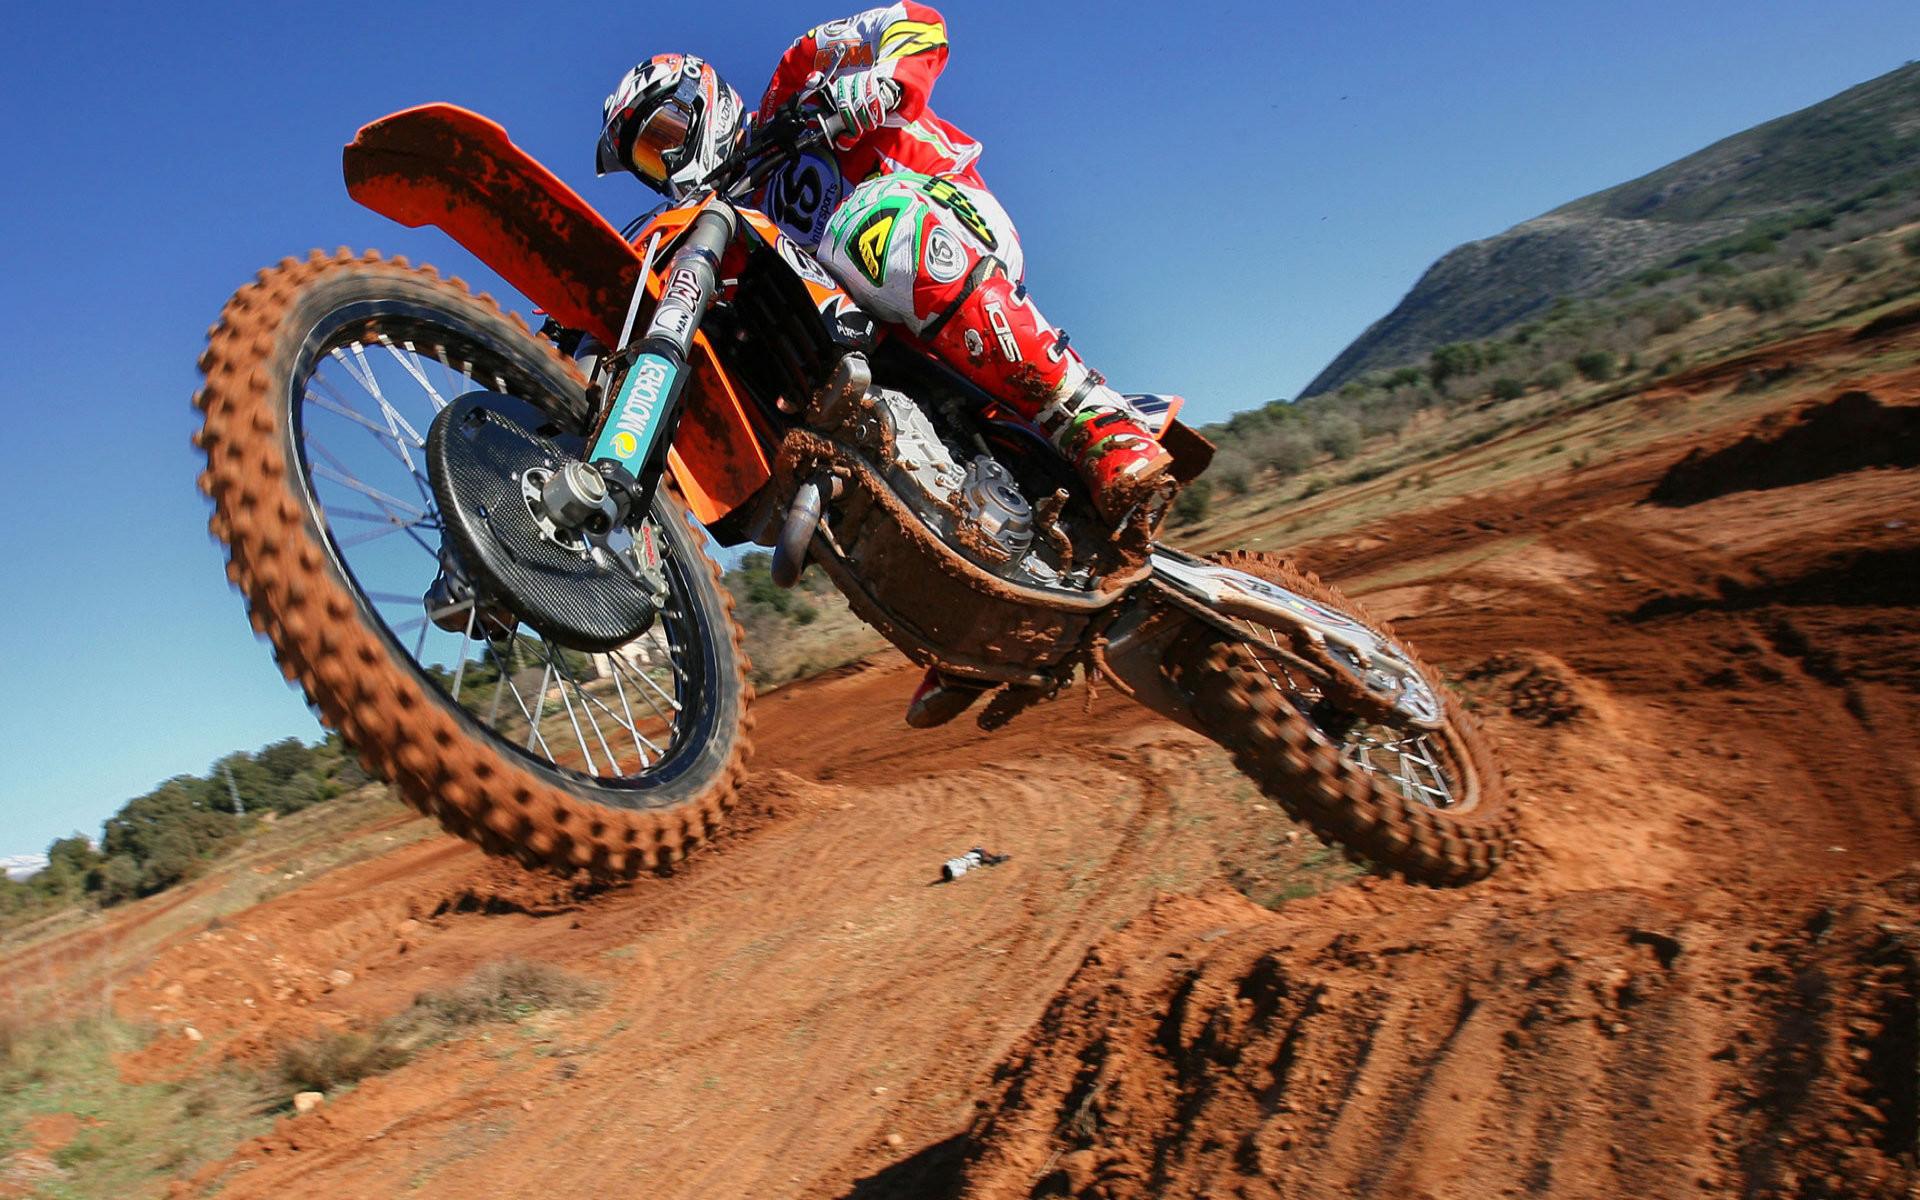 Yamaha Dirt Bikes Motocross Wallpaper Hd | Hd Wallpapers